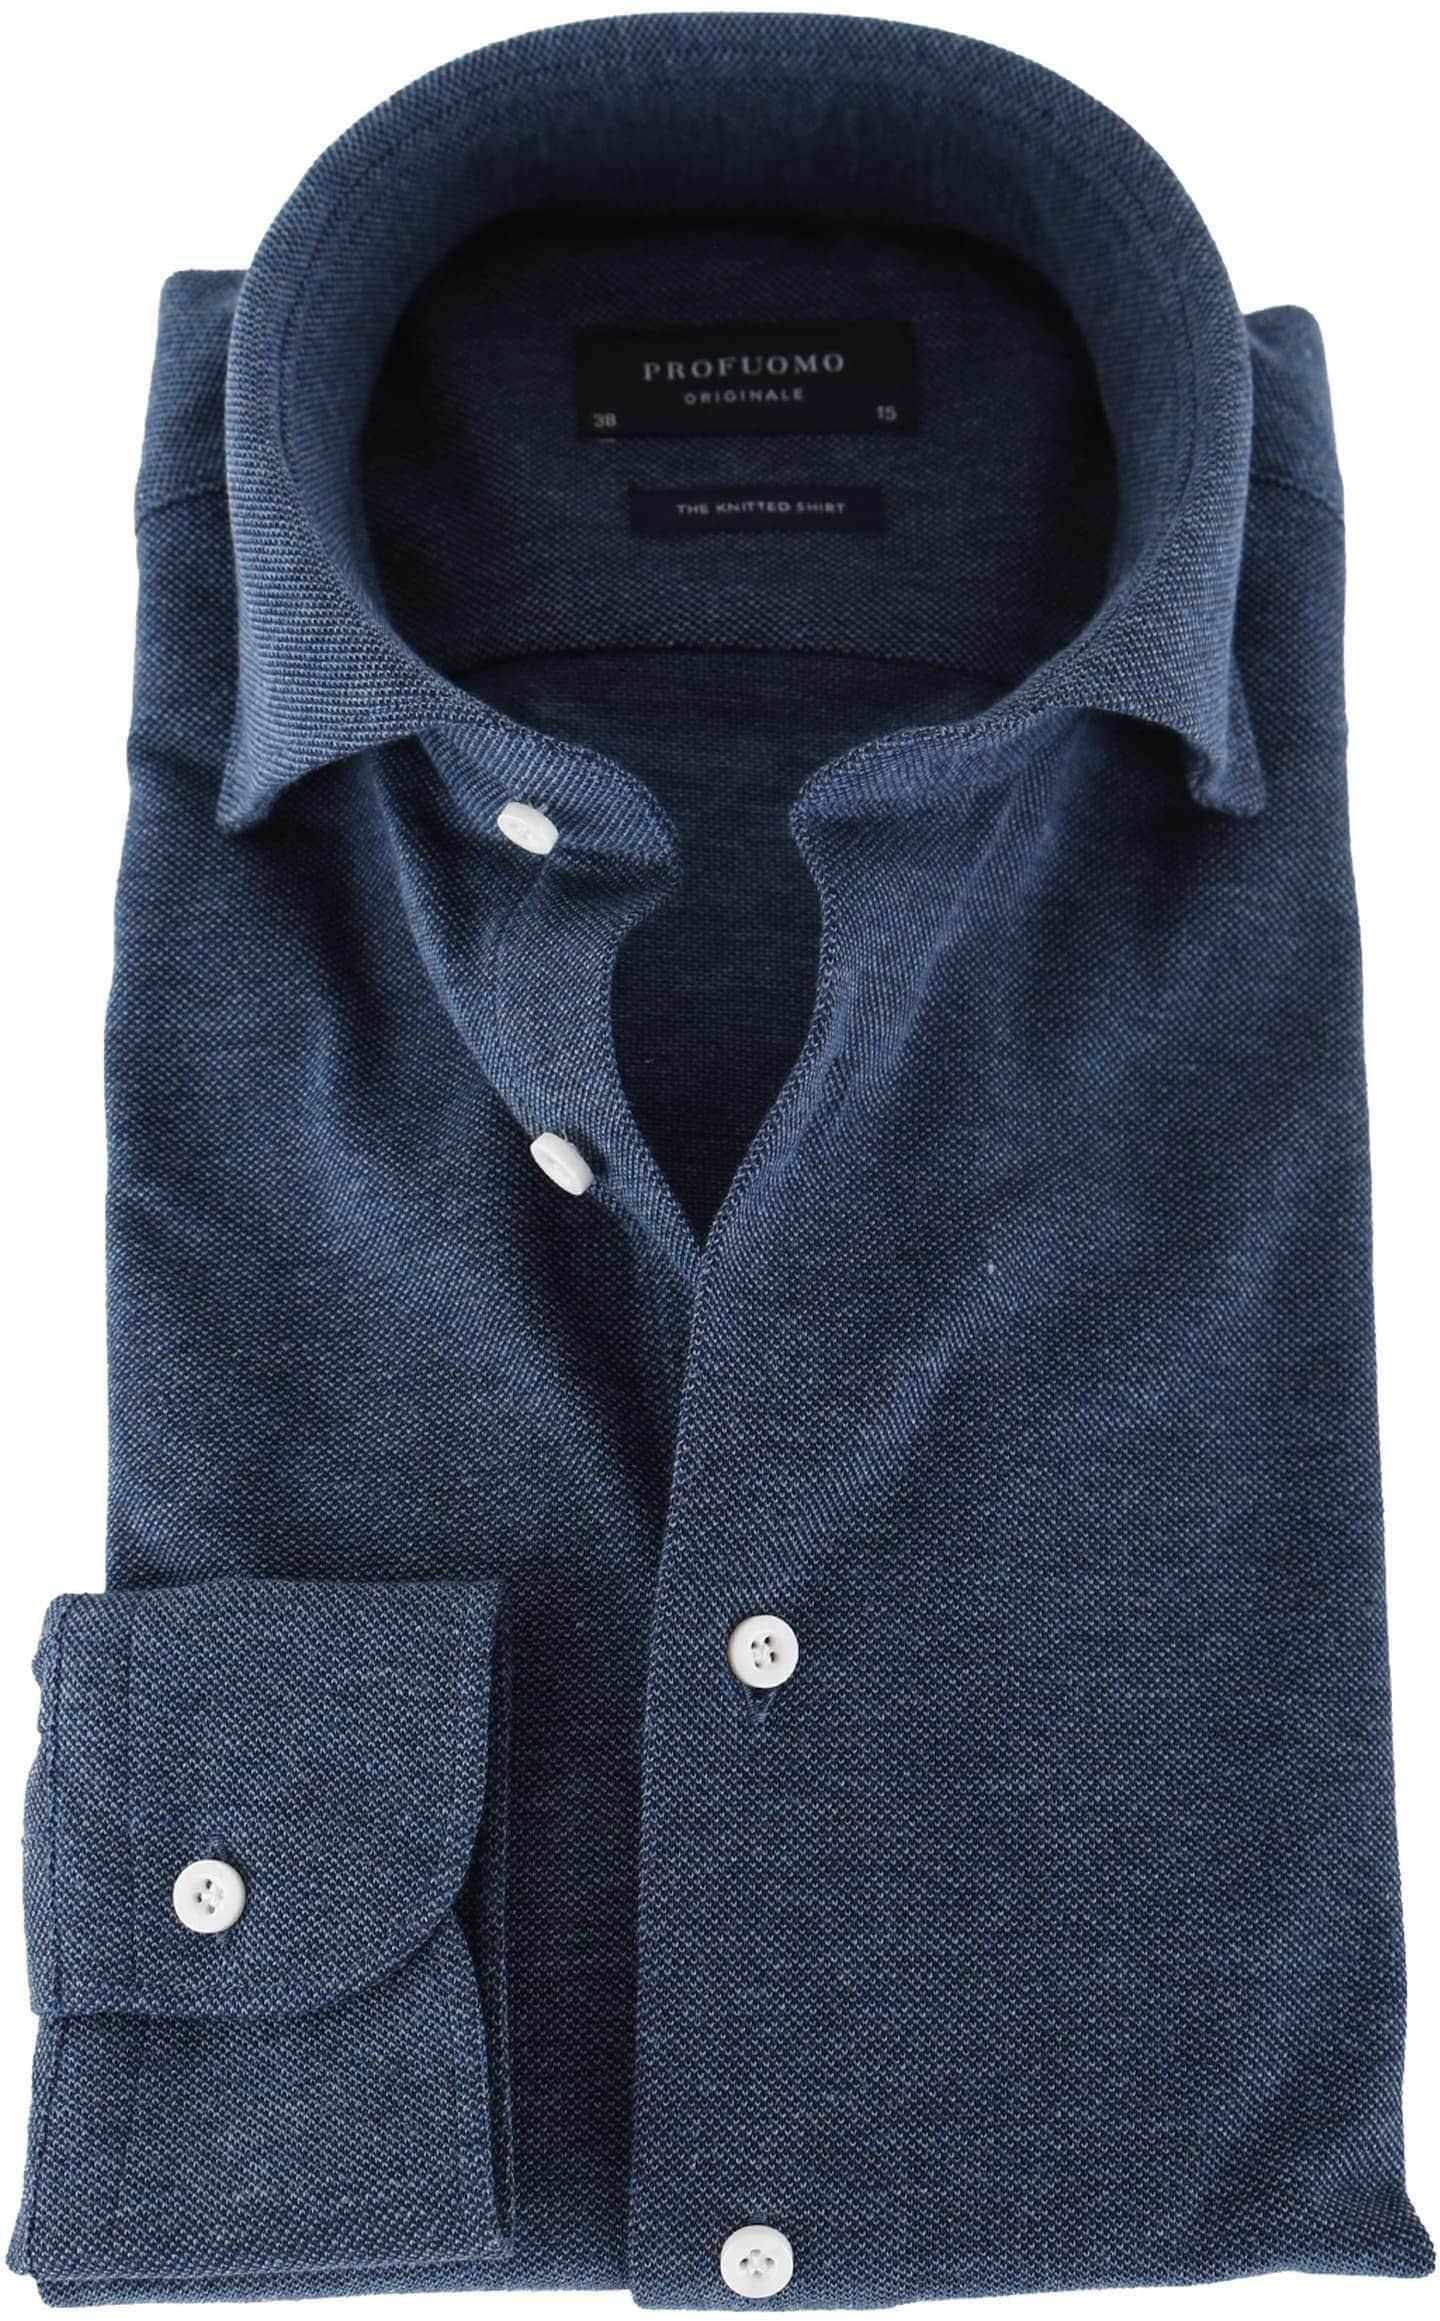 Profuomo Overhemd Knitted Indigoblauw foto 0